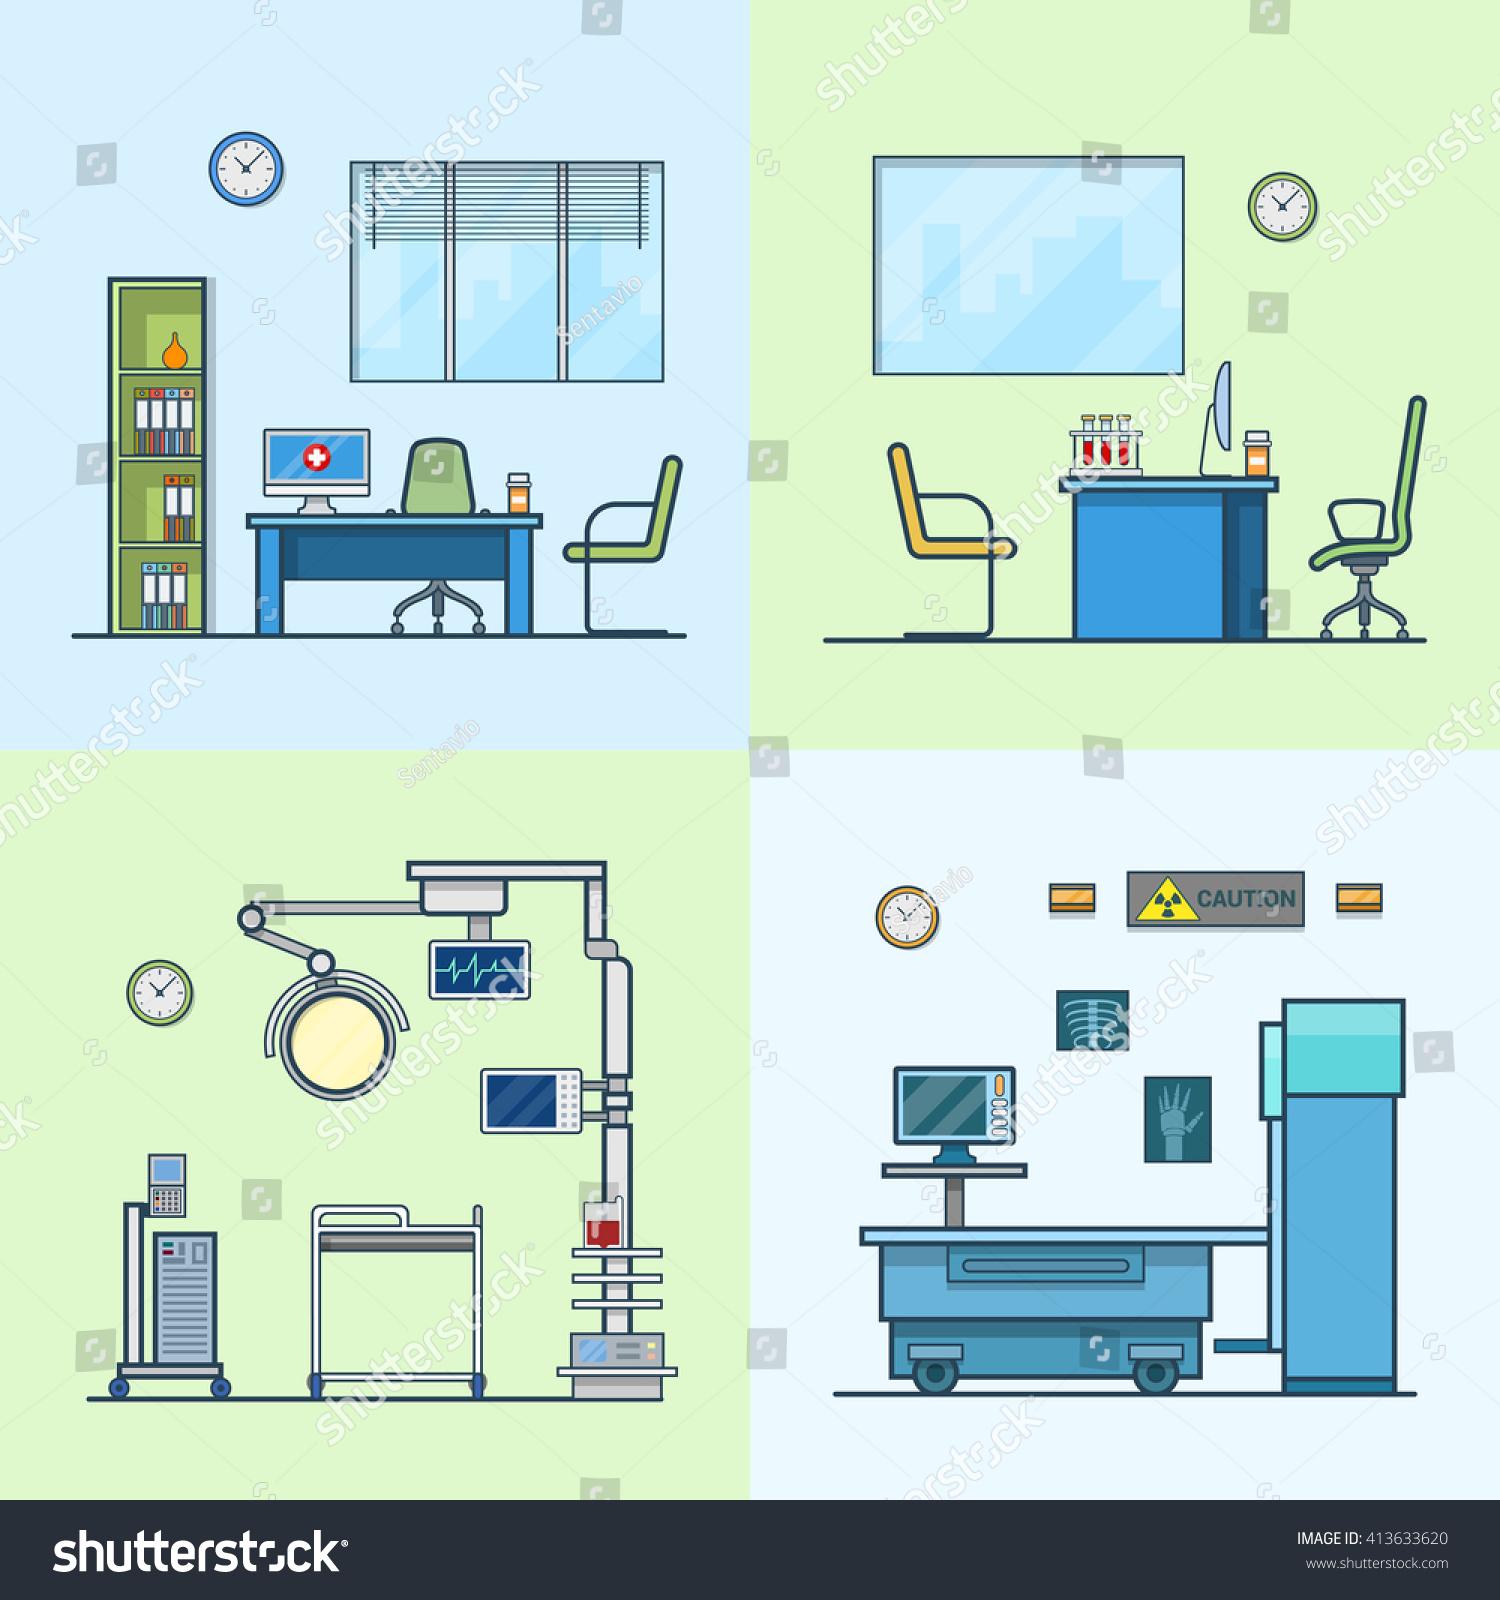 Hospital Medicine Cabinet Hospital Clinic Medical Medicine Dispensary Lab Operation Room X